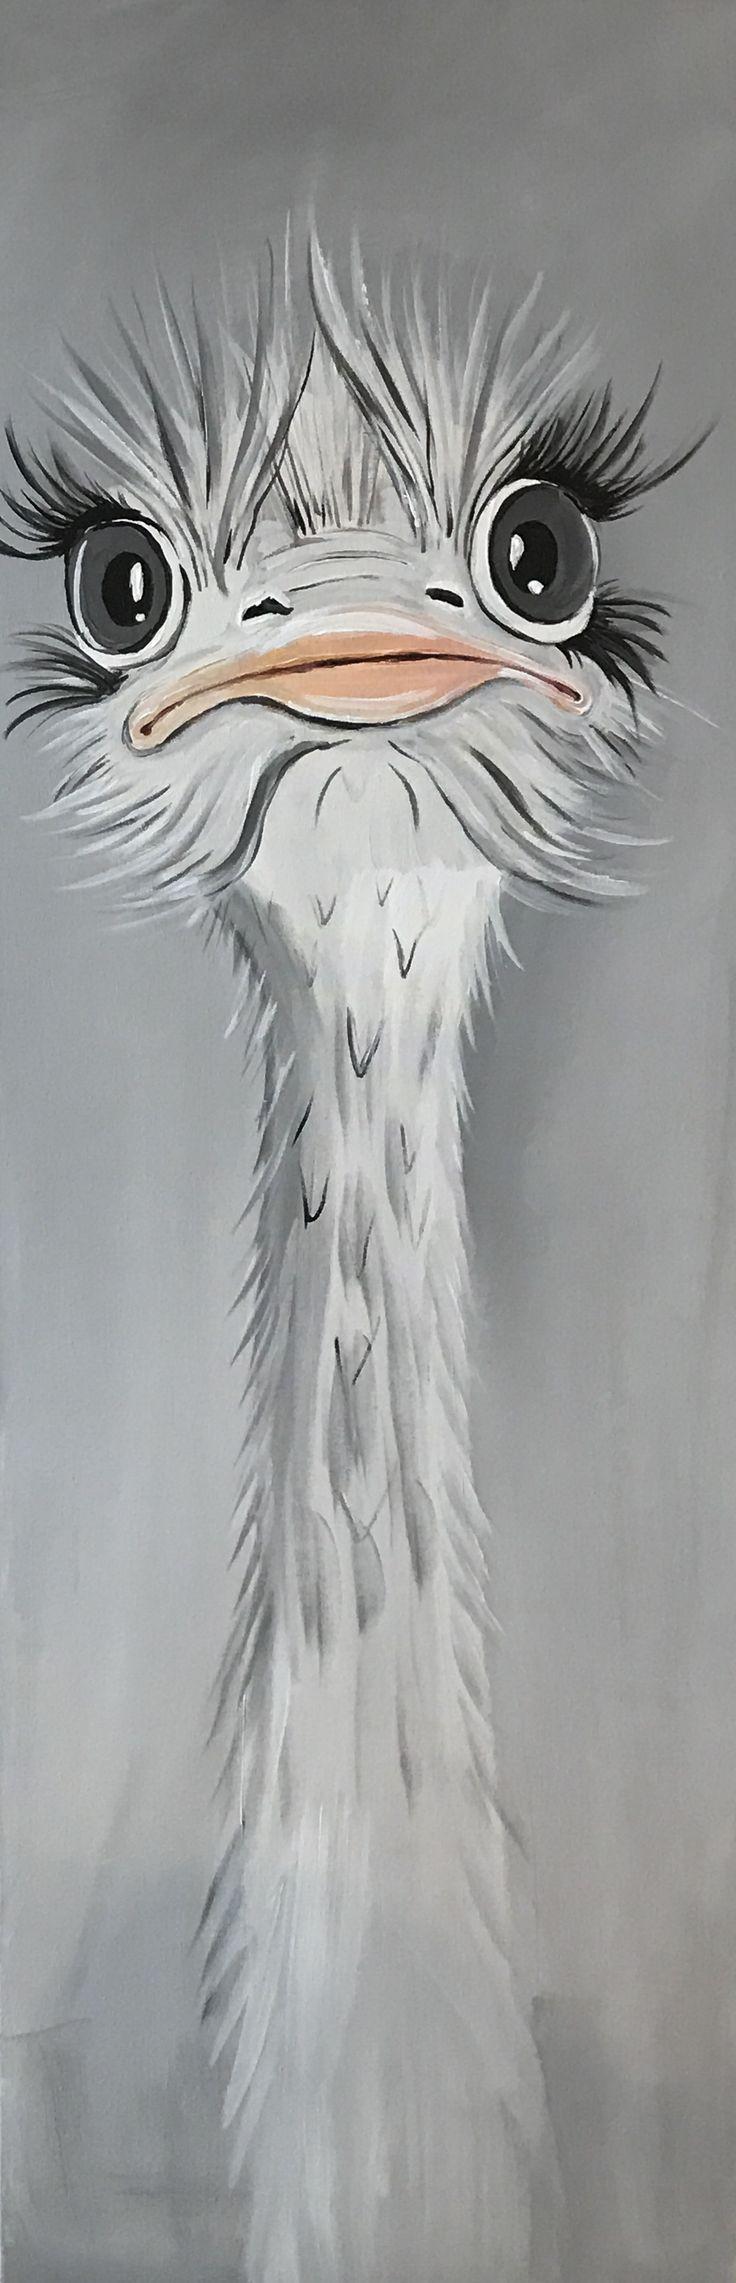 Schneestrauss grau weiss lachs, Acryl, 80 x 120, 690 Euro